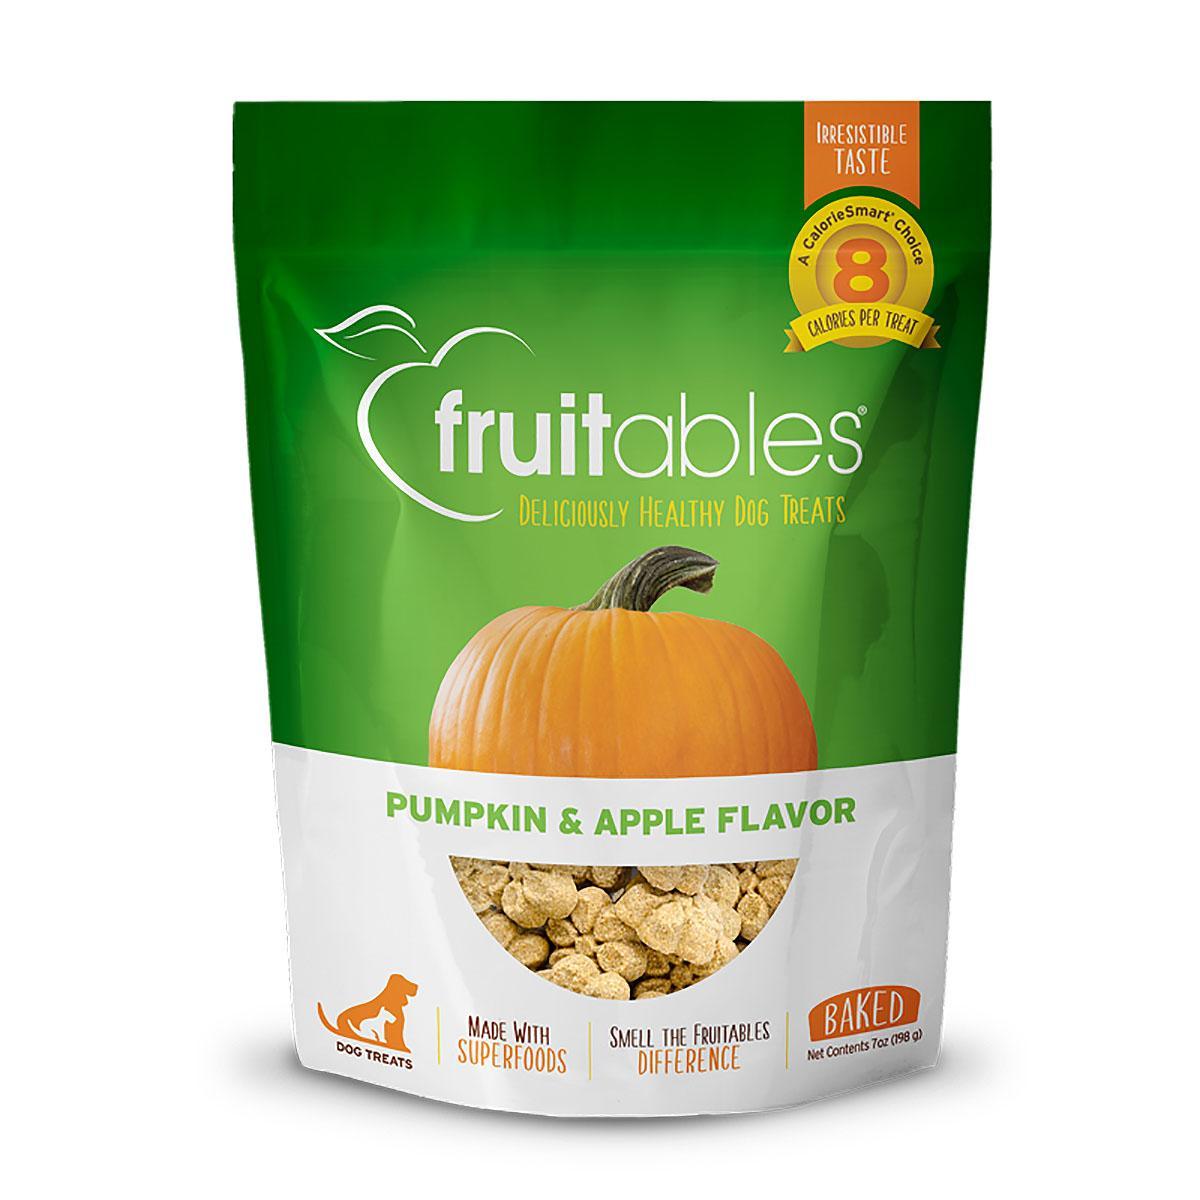 Fruitables Dog Treats - Pumpkin & Apple